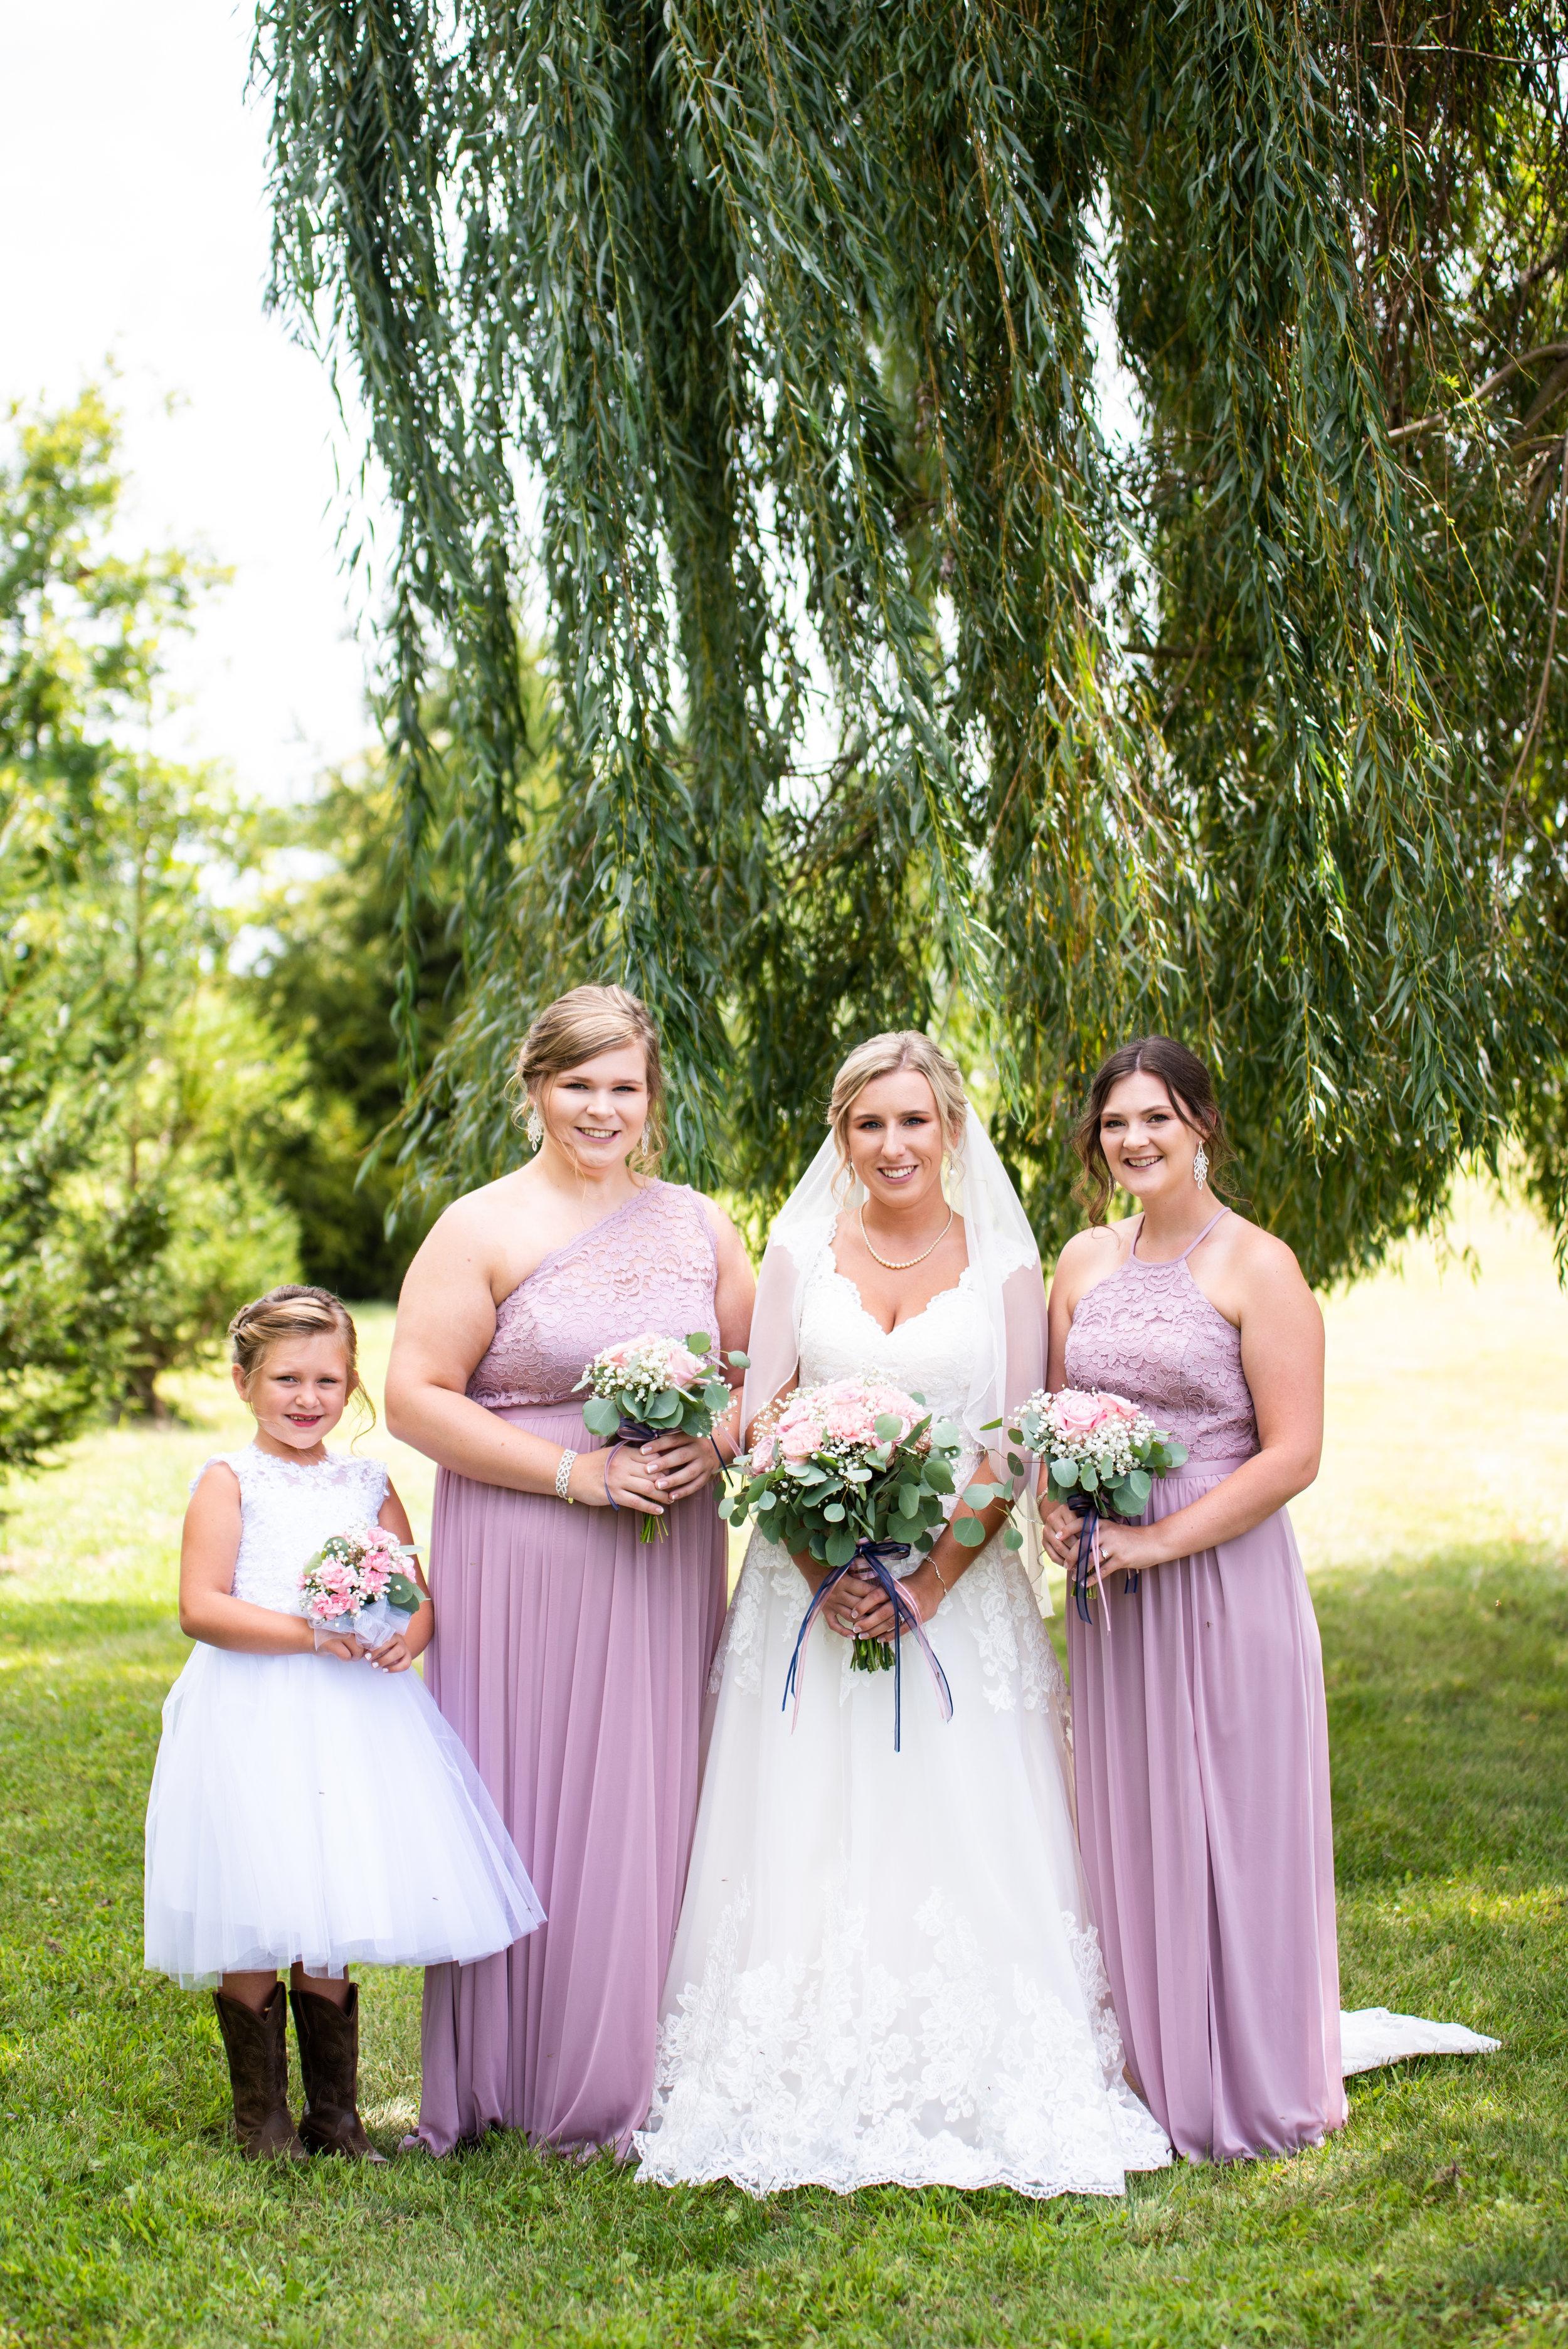 wedding (1 of 1)-26.jpg